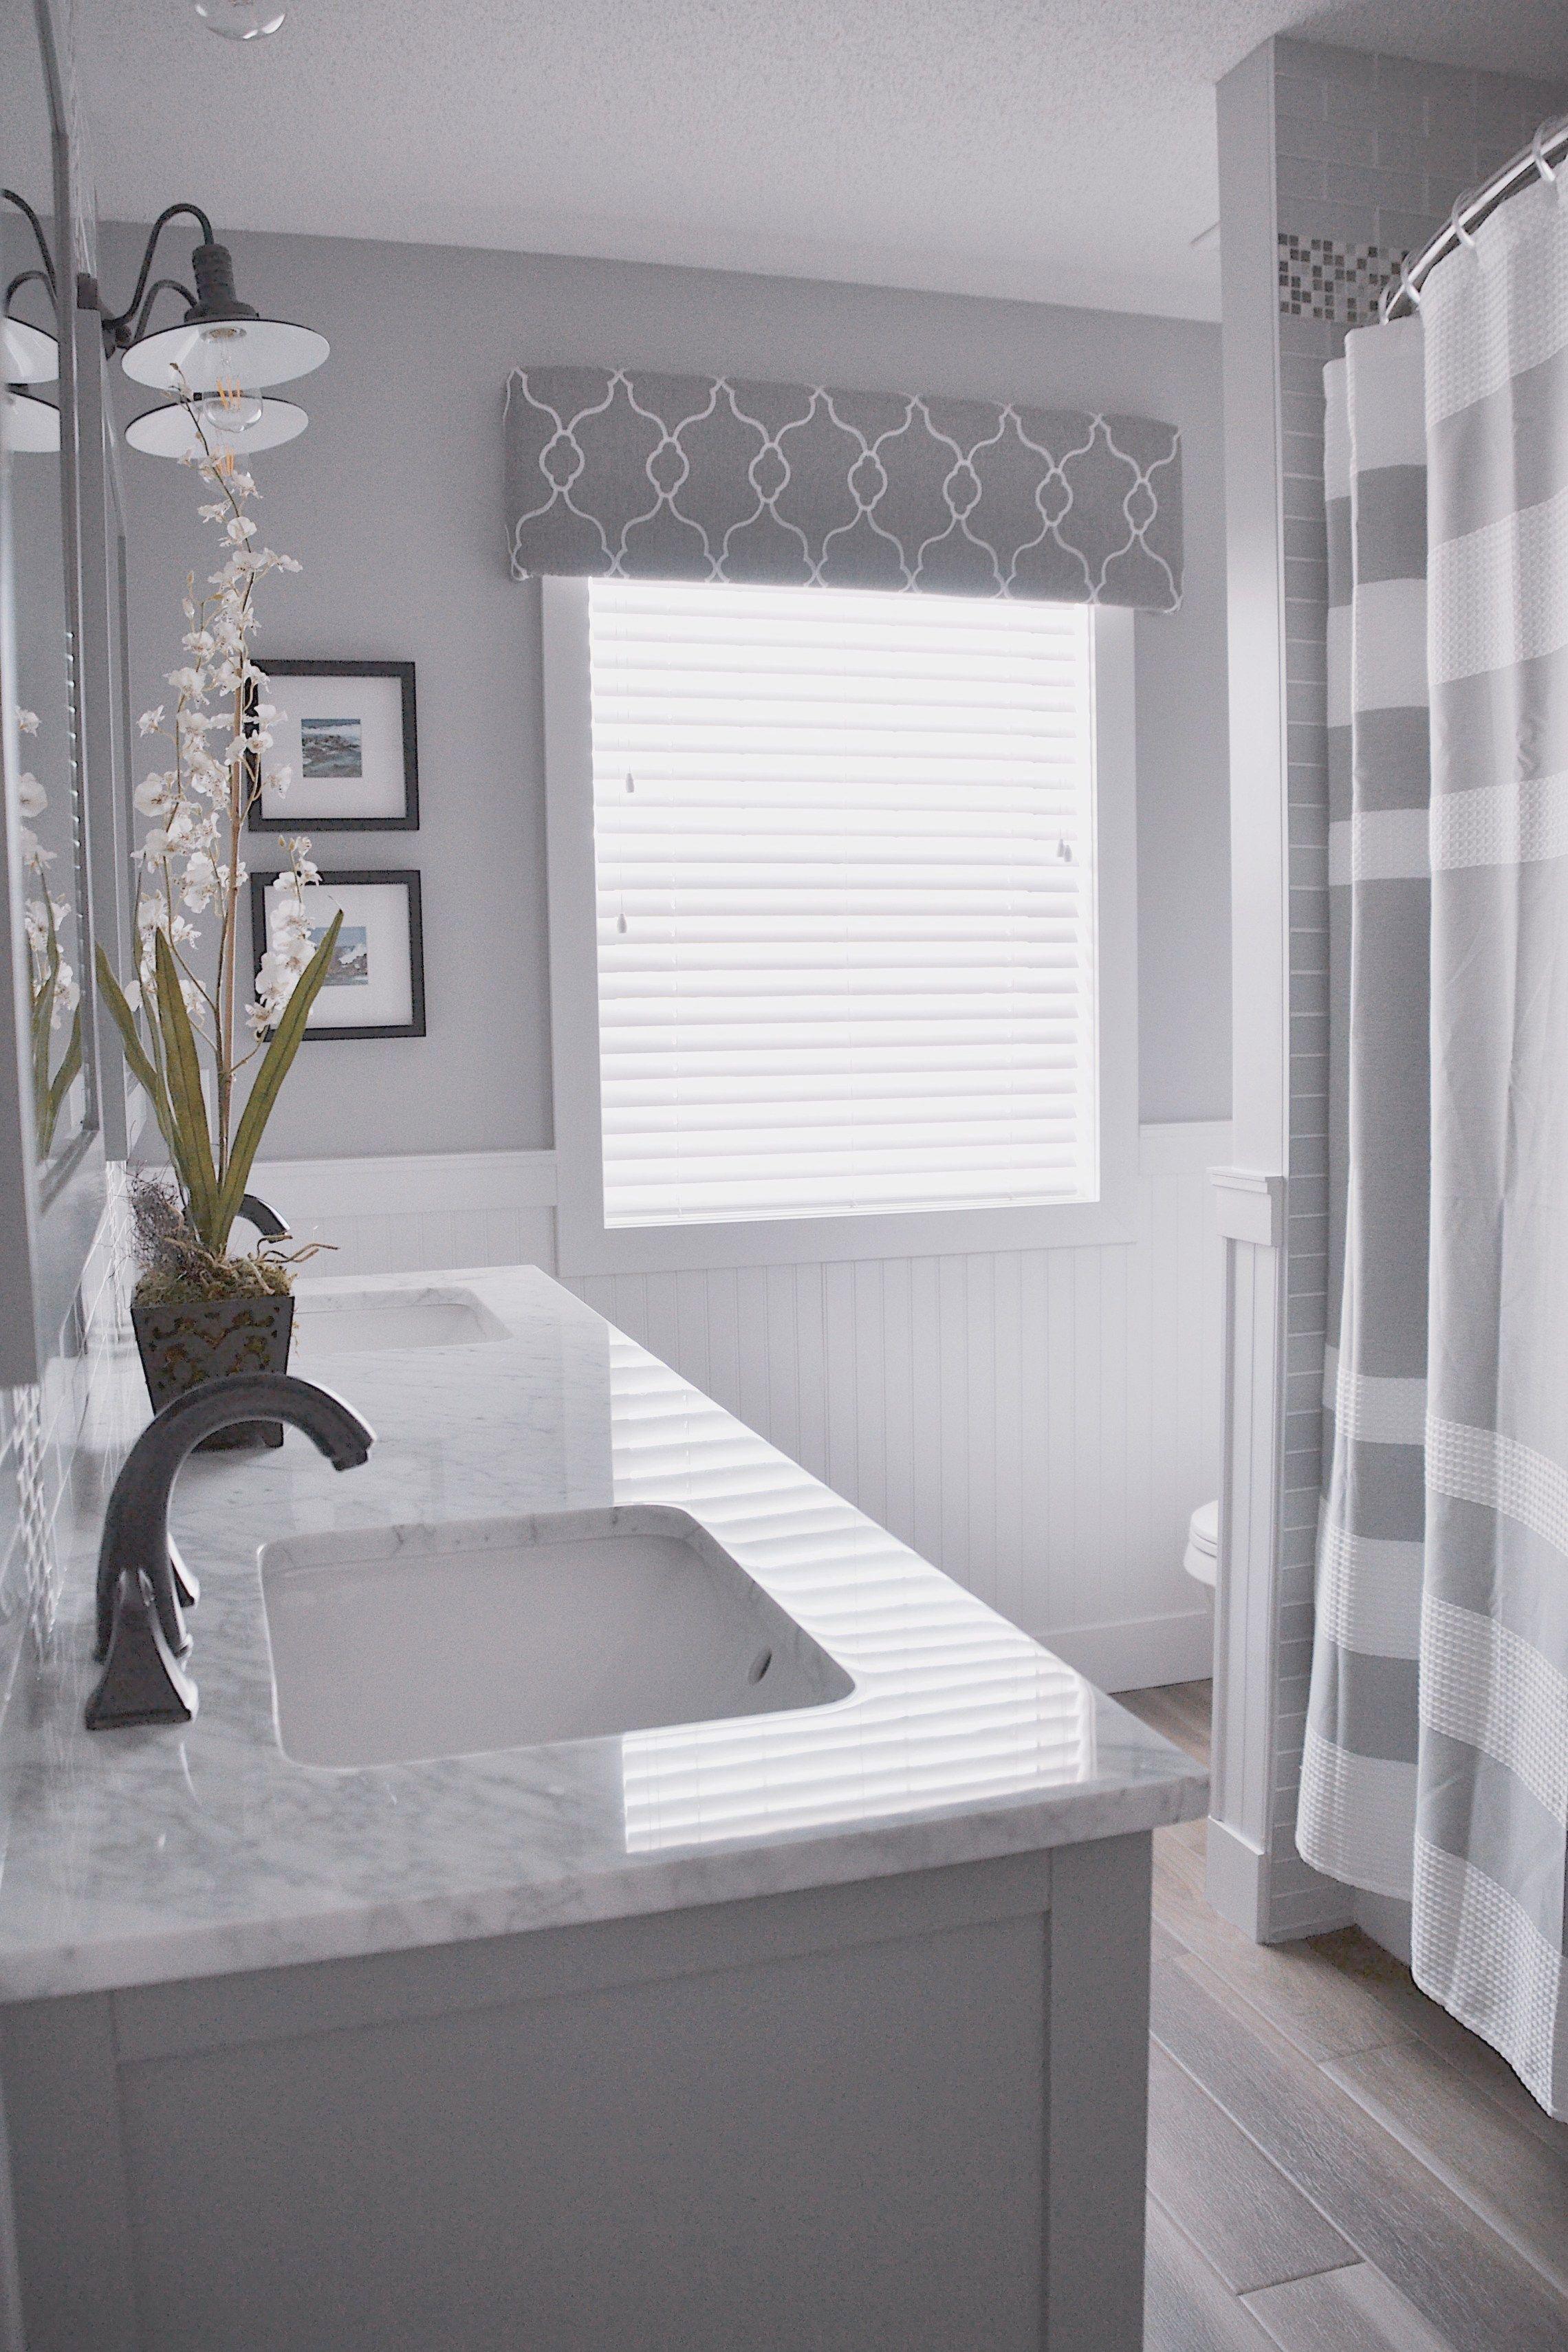 Bathroom sink faucet replacement when bathroom light